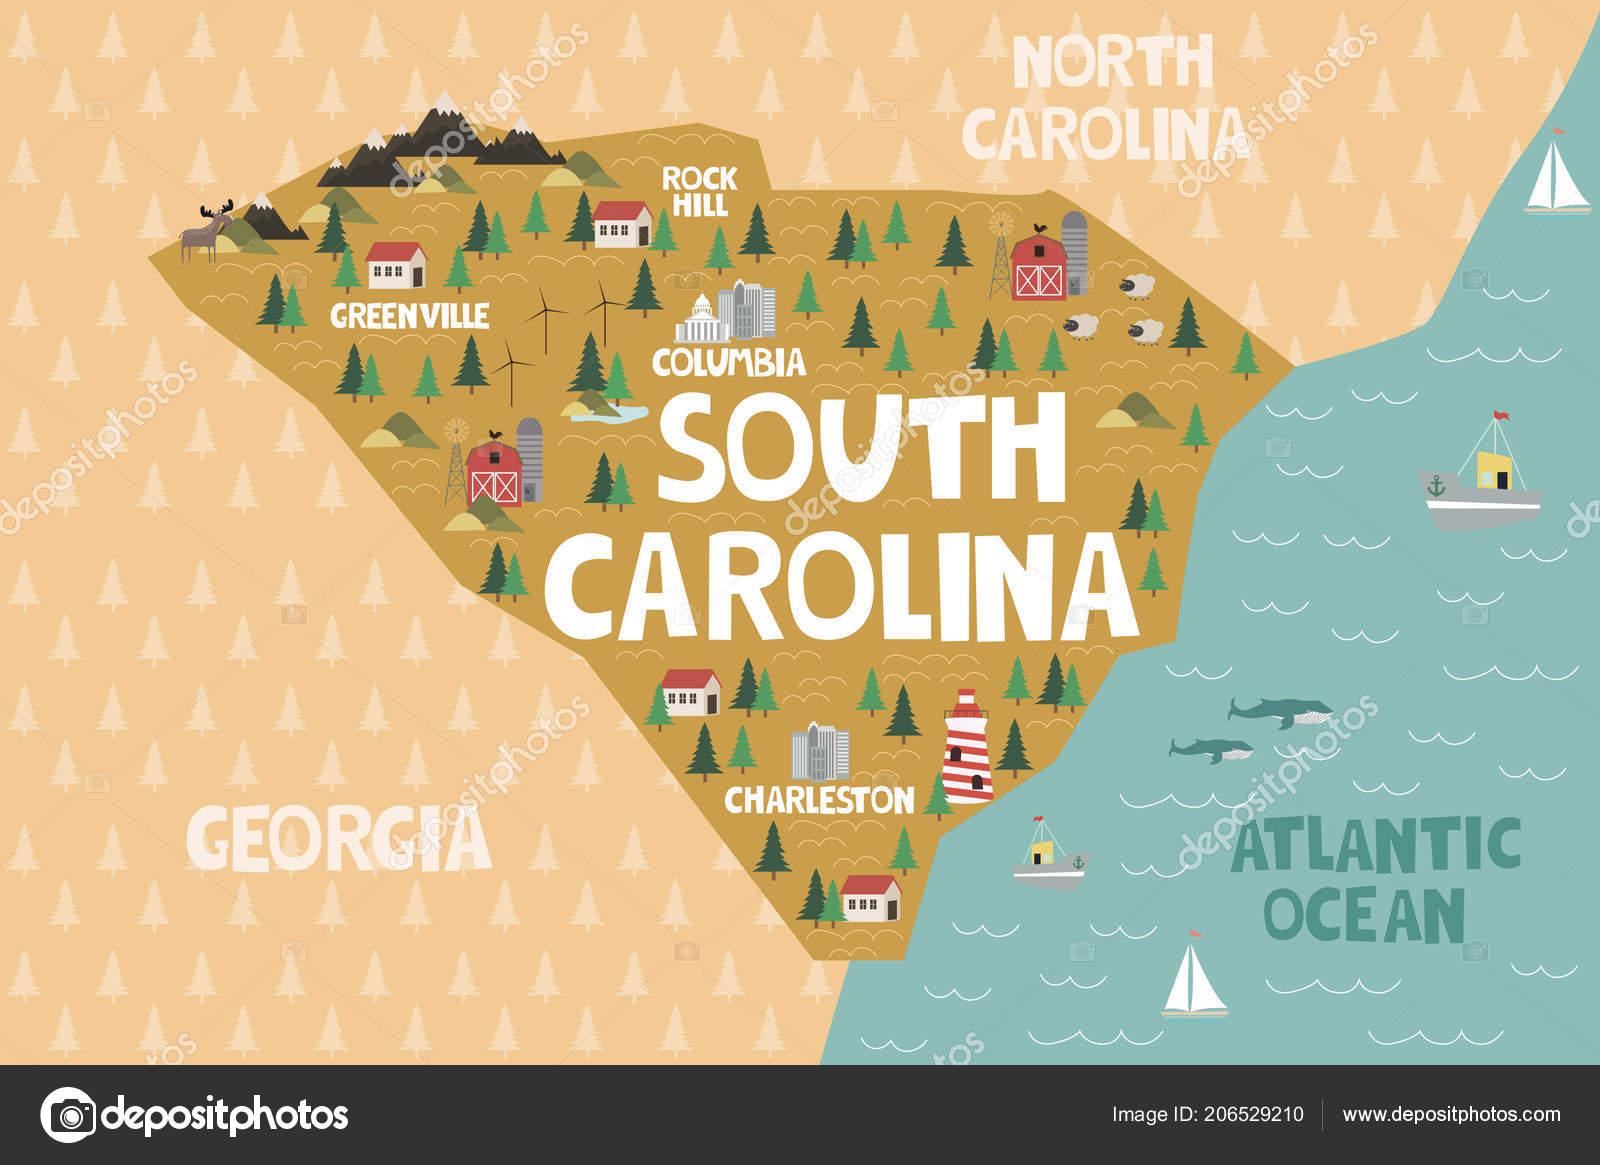 State South Carolina Map.Illustrated Map State South Carolina United States Cities Landmarks